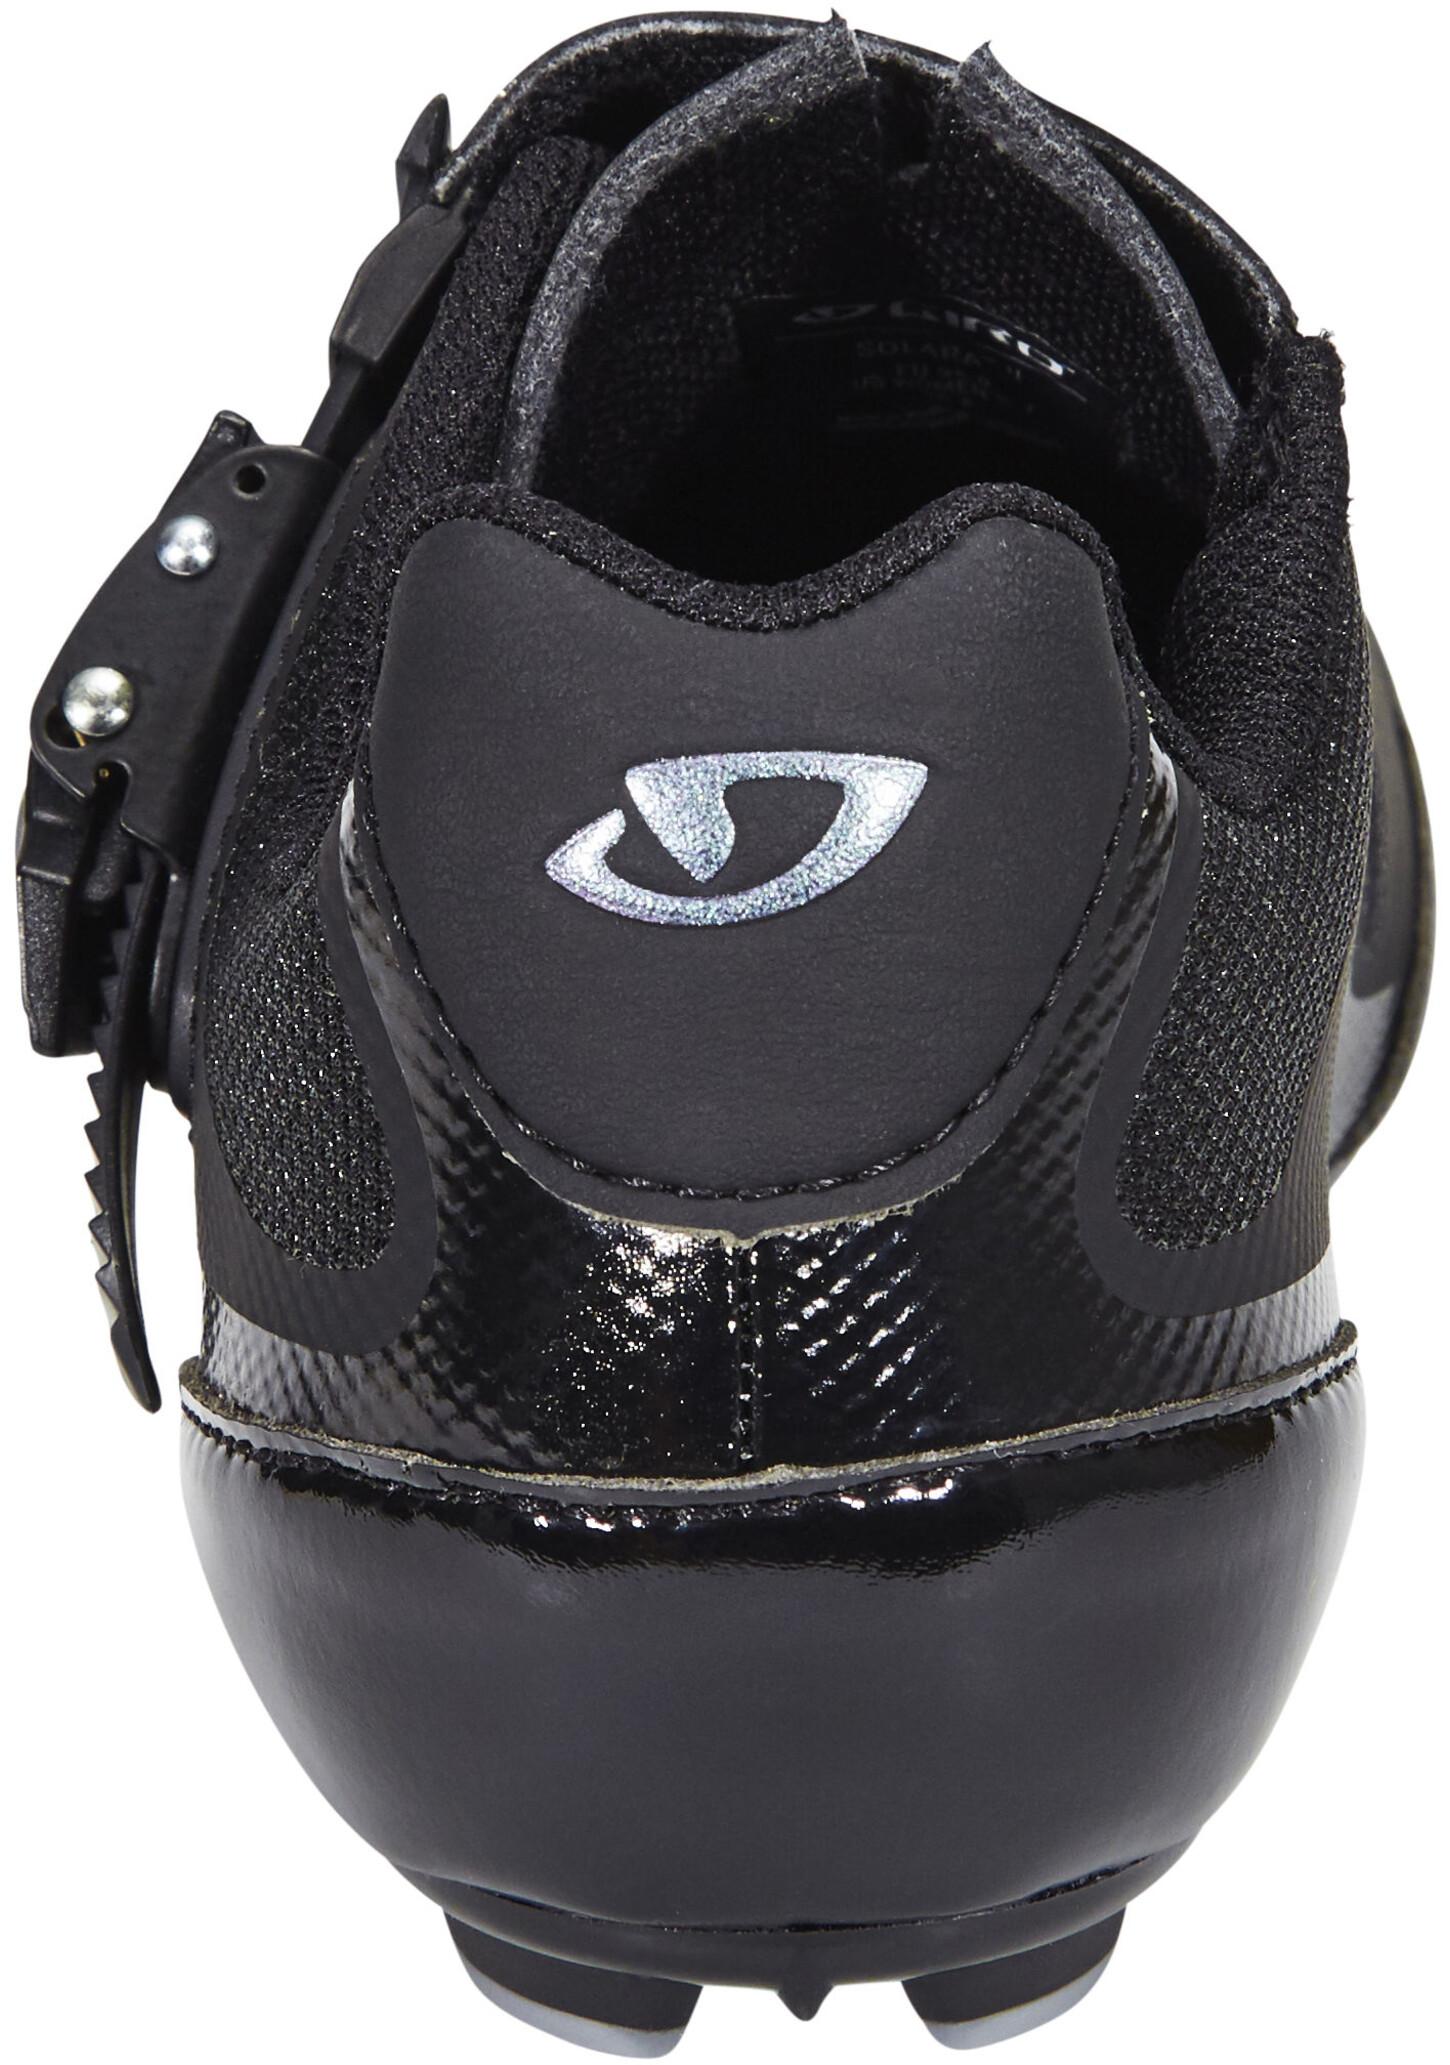 067414a1b9e Giro Solara II Shoes Women black at Bikester.co.uk